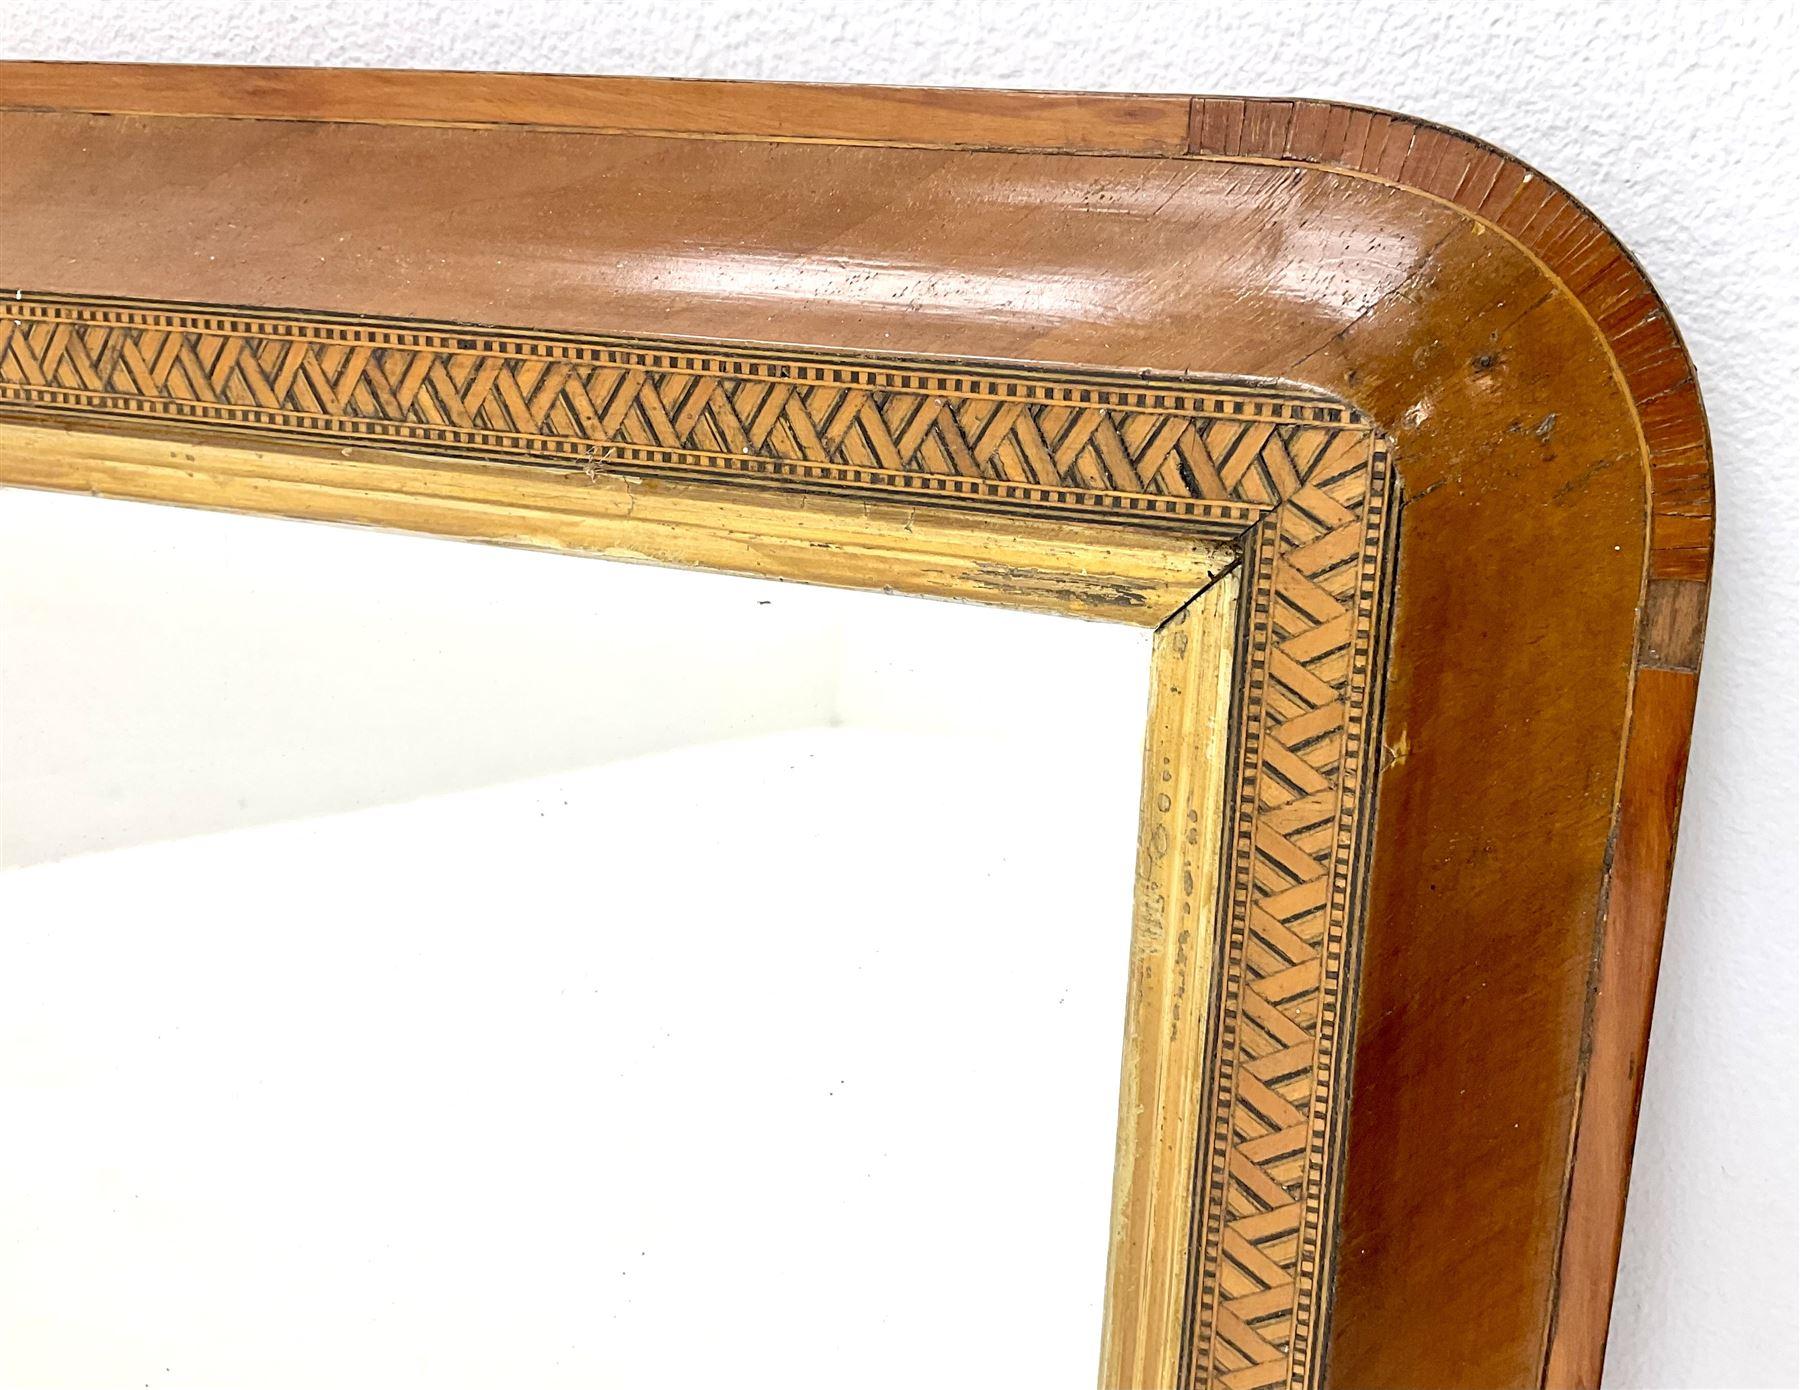 Victorian inlaid walnut framed Tunbridge Ware overmantle mirror - Image 2 of 2